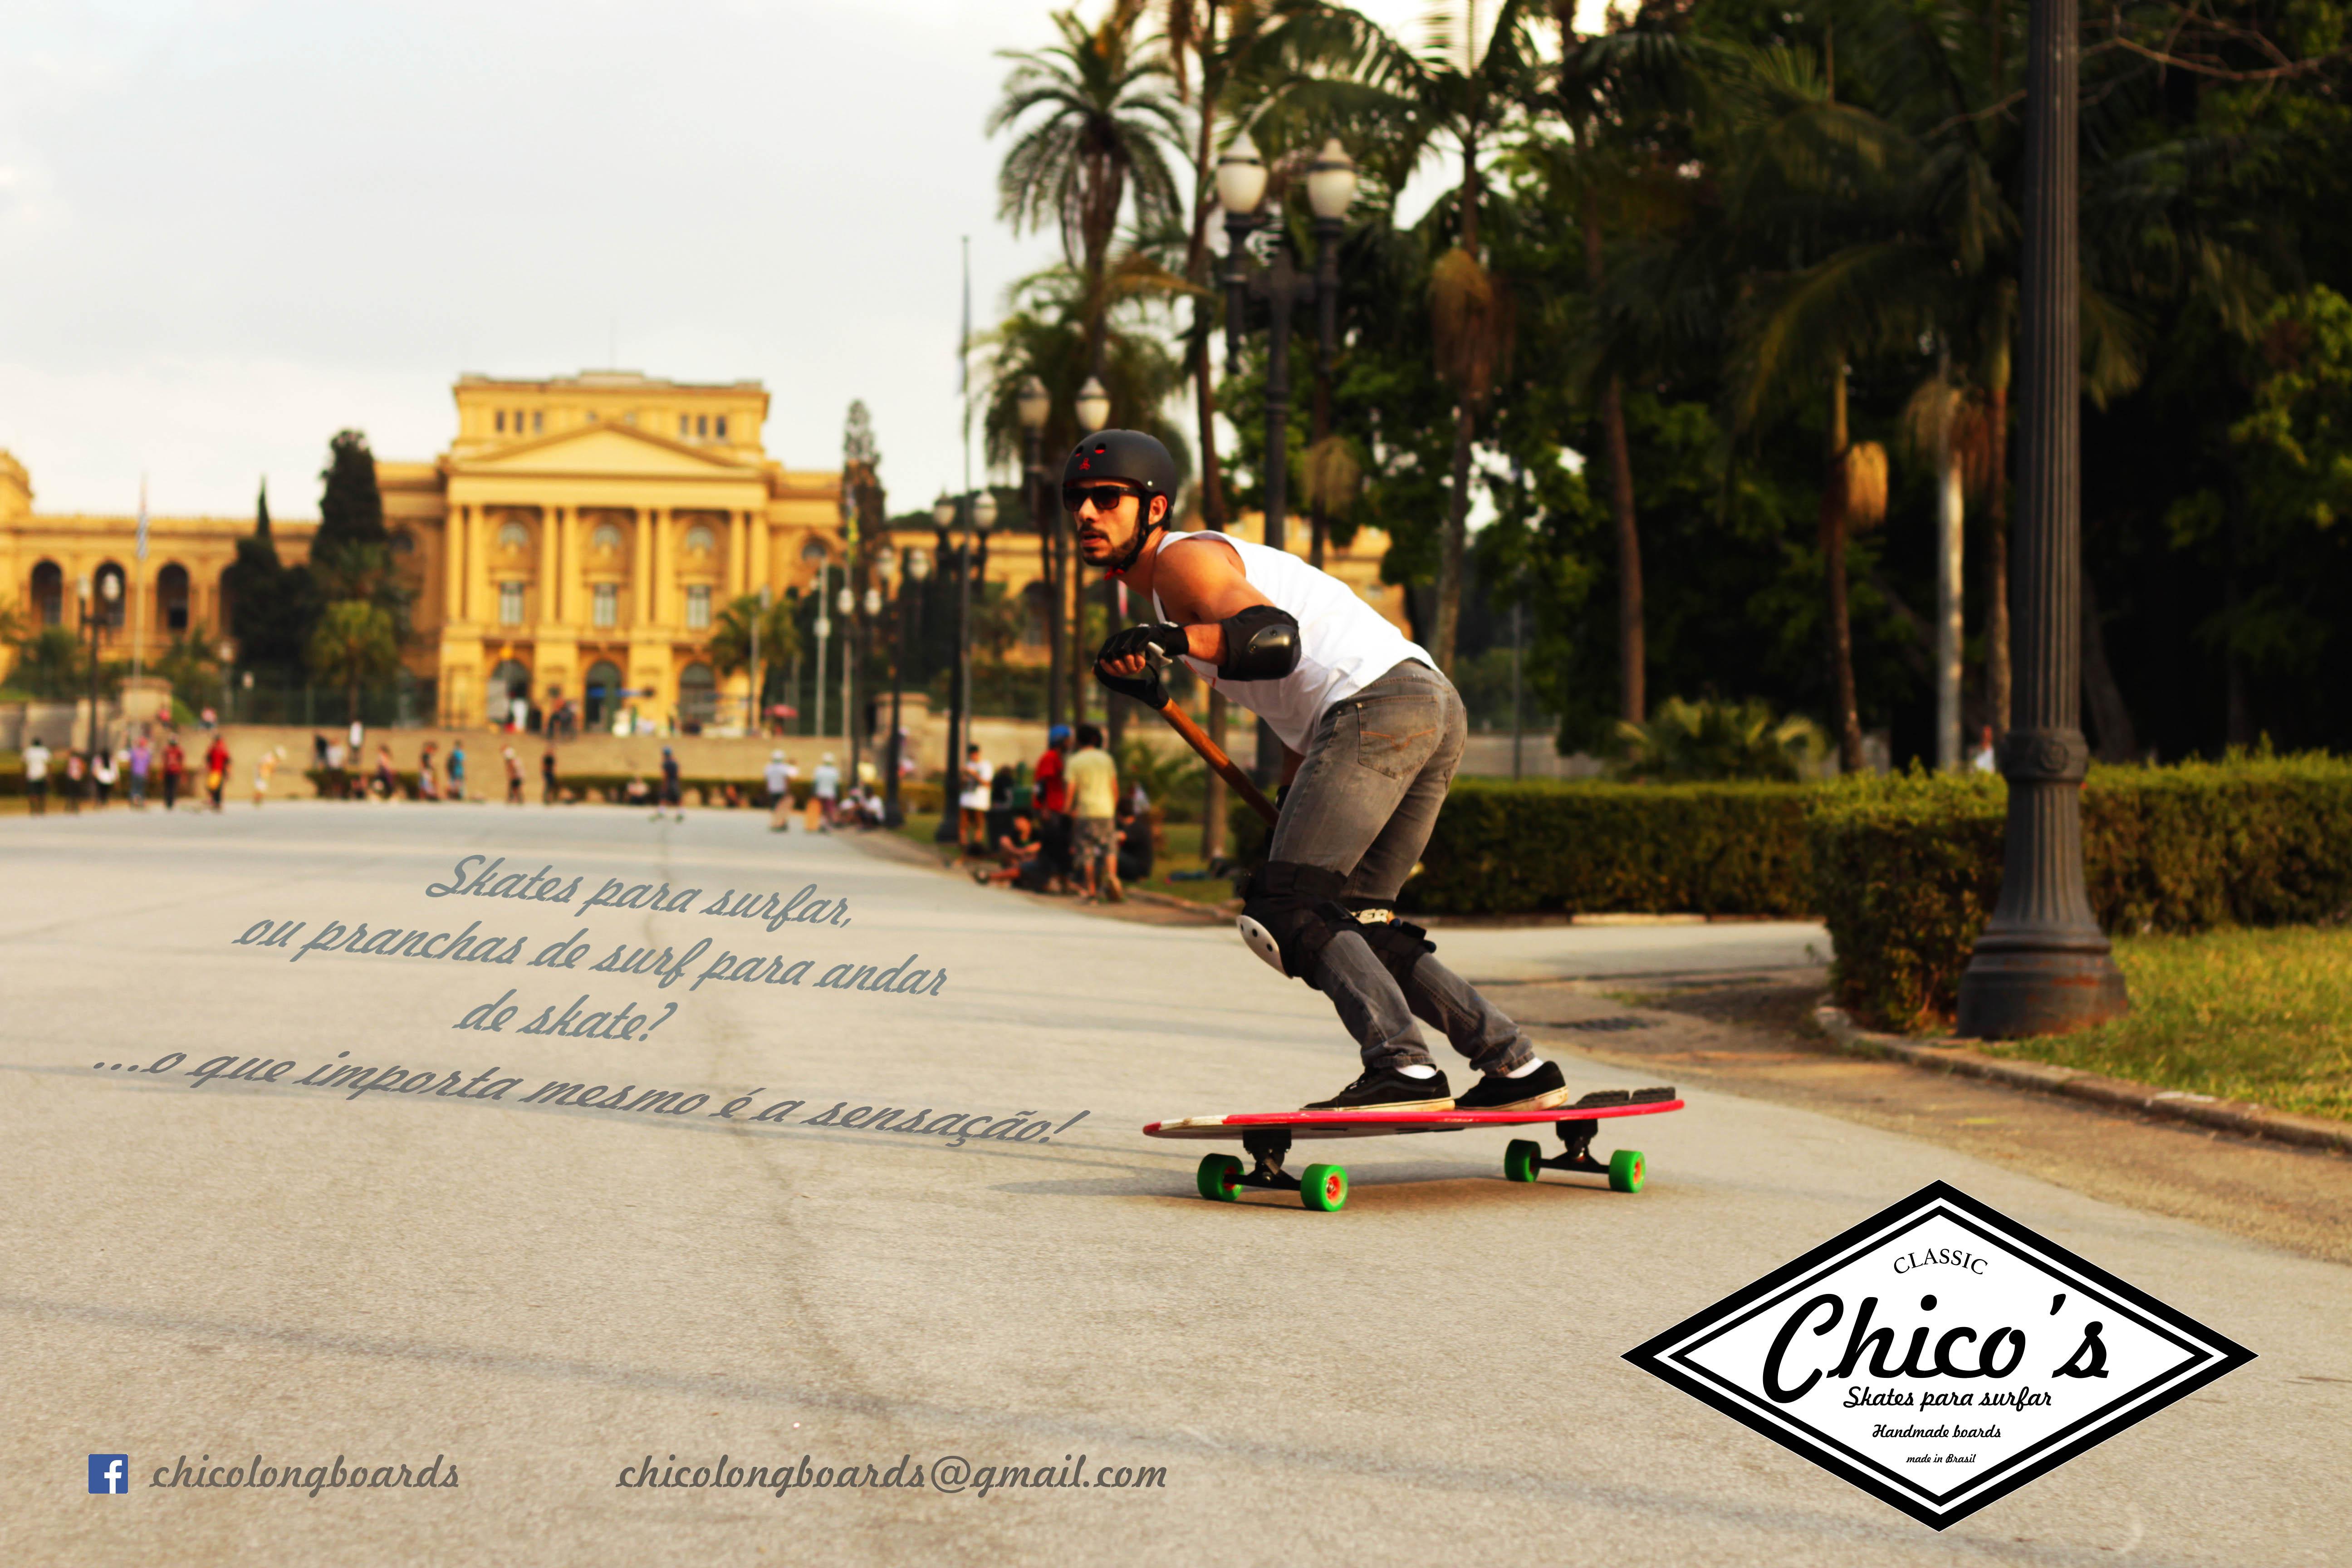 skates para surfar ou pranchas para ndar de skate